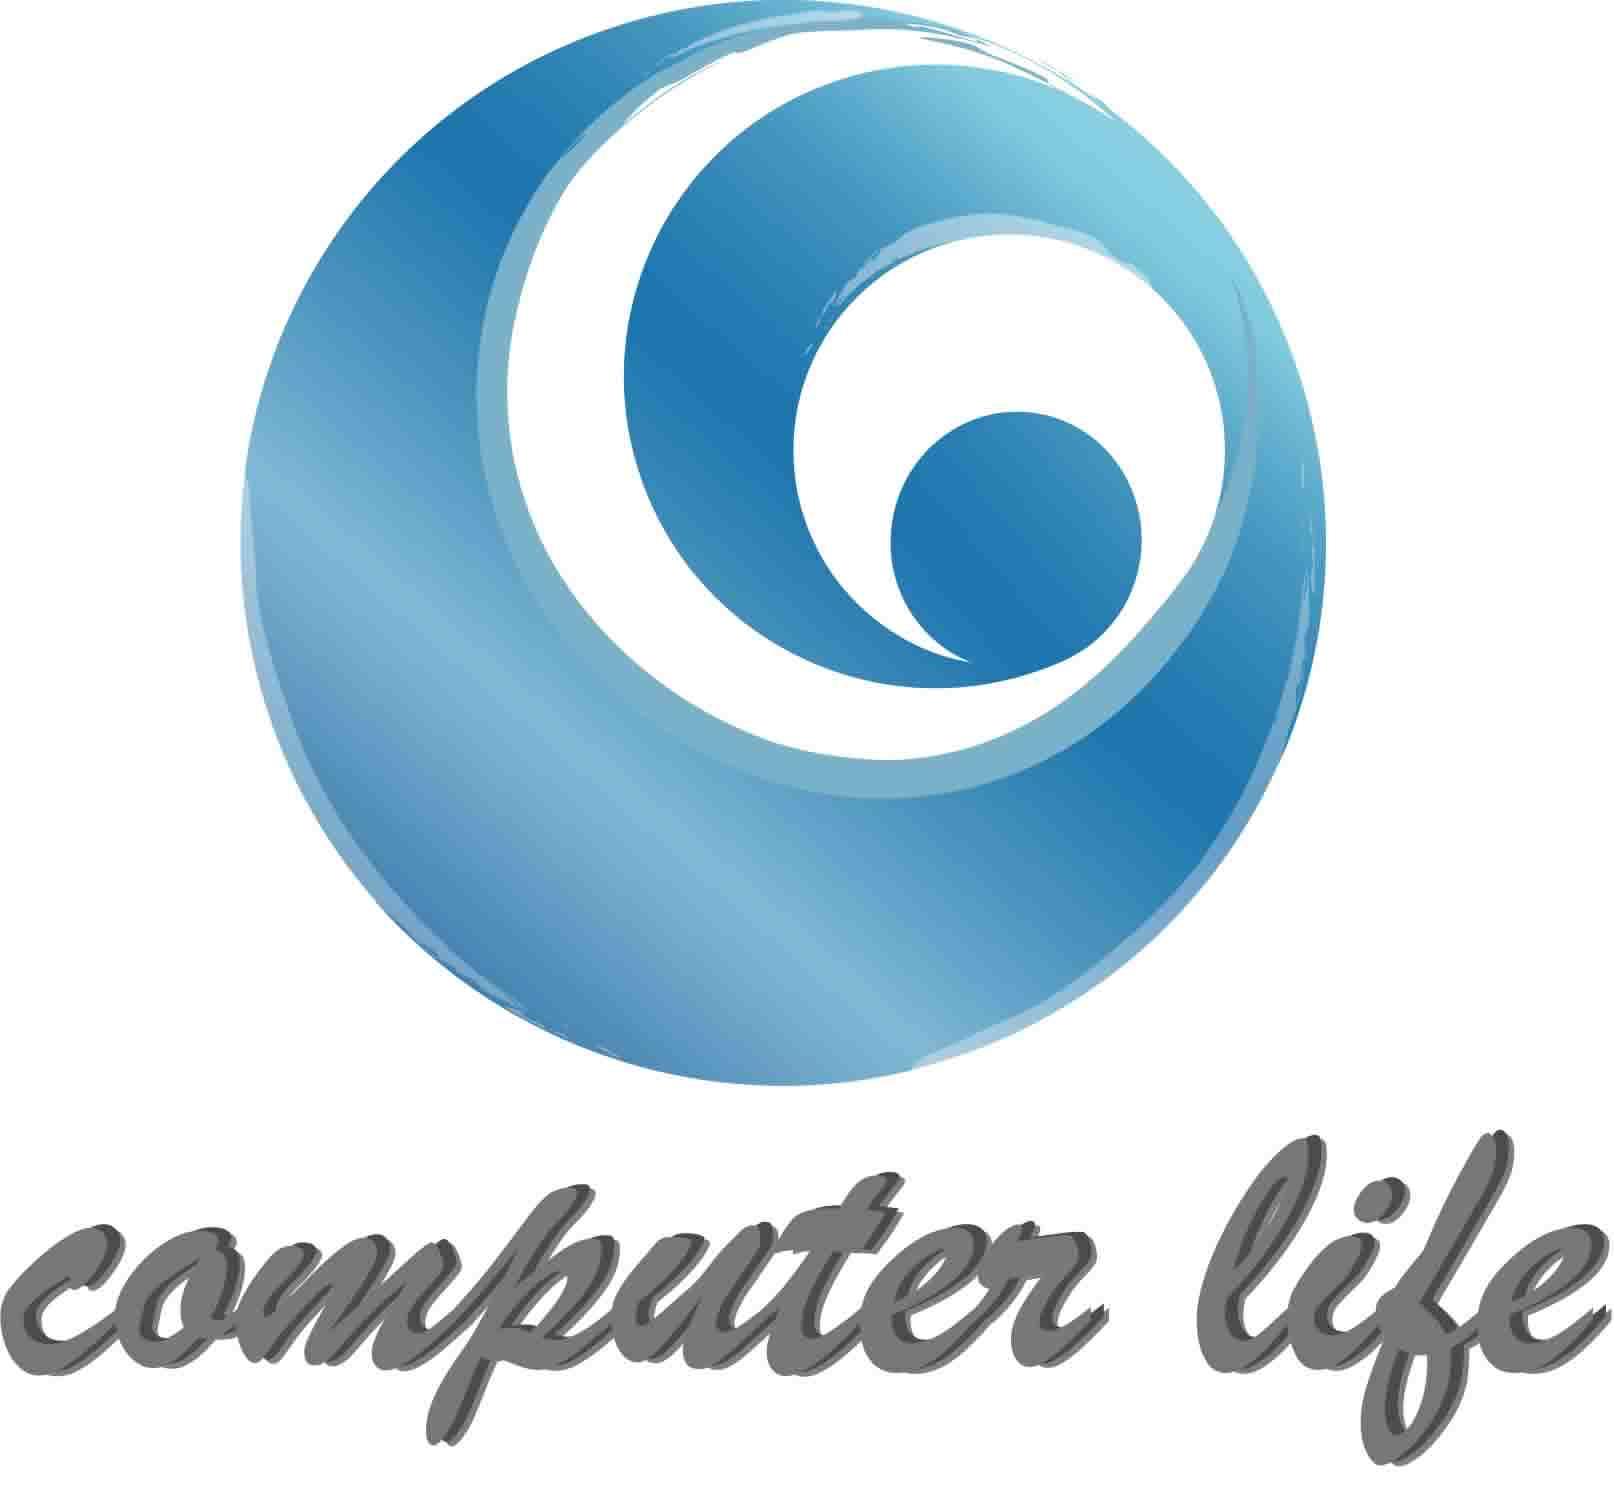 computer life,text,product,font,logo,circle